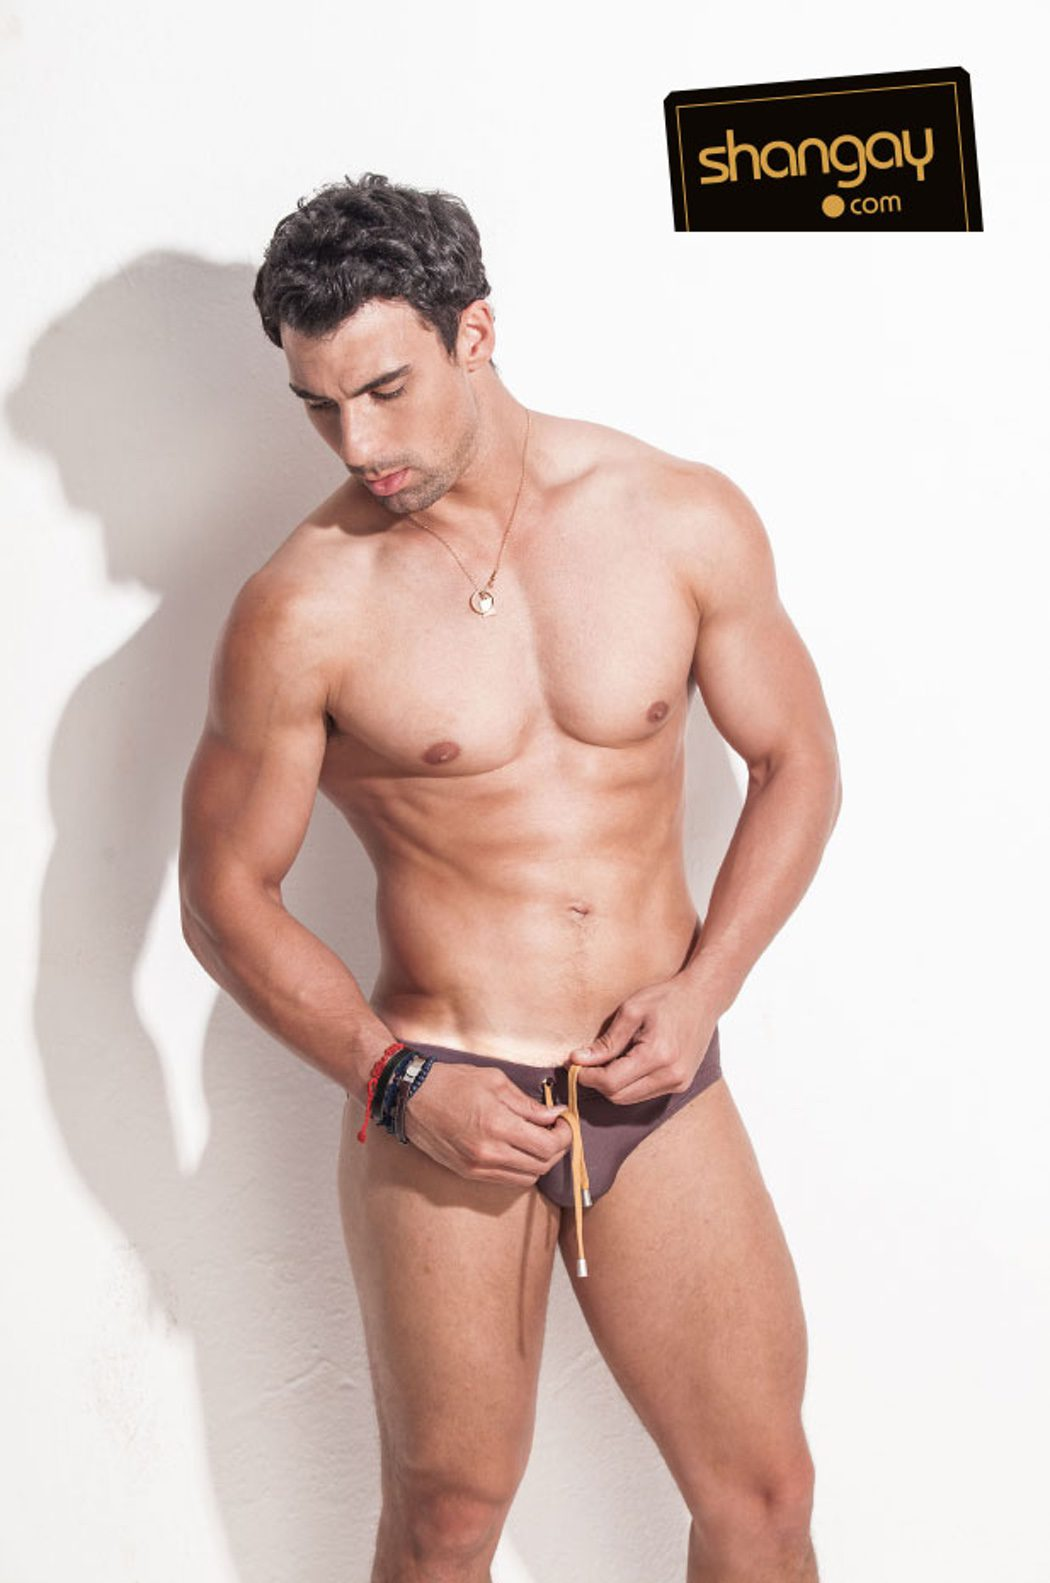 Desnudo con helado pic